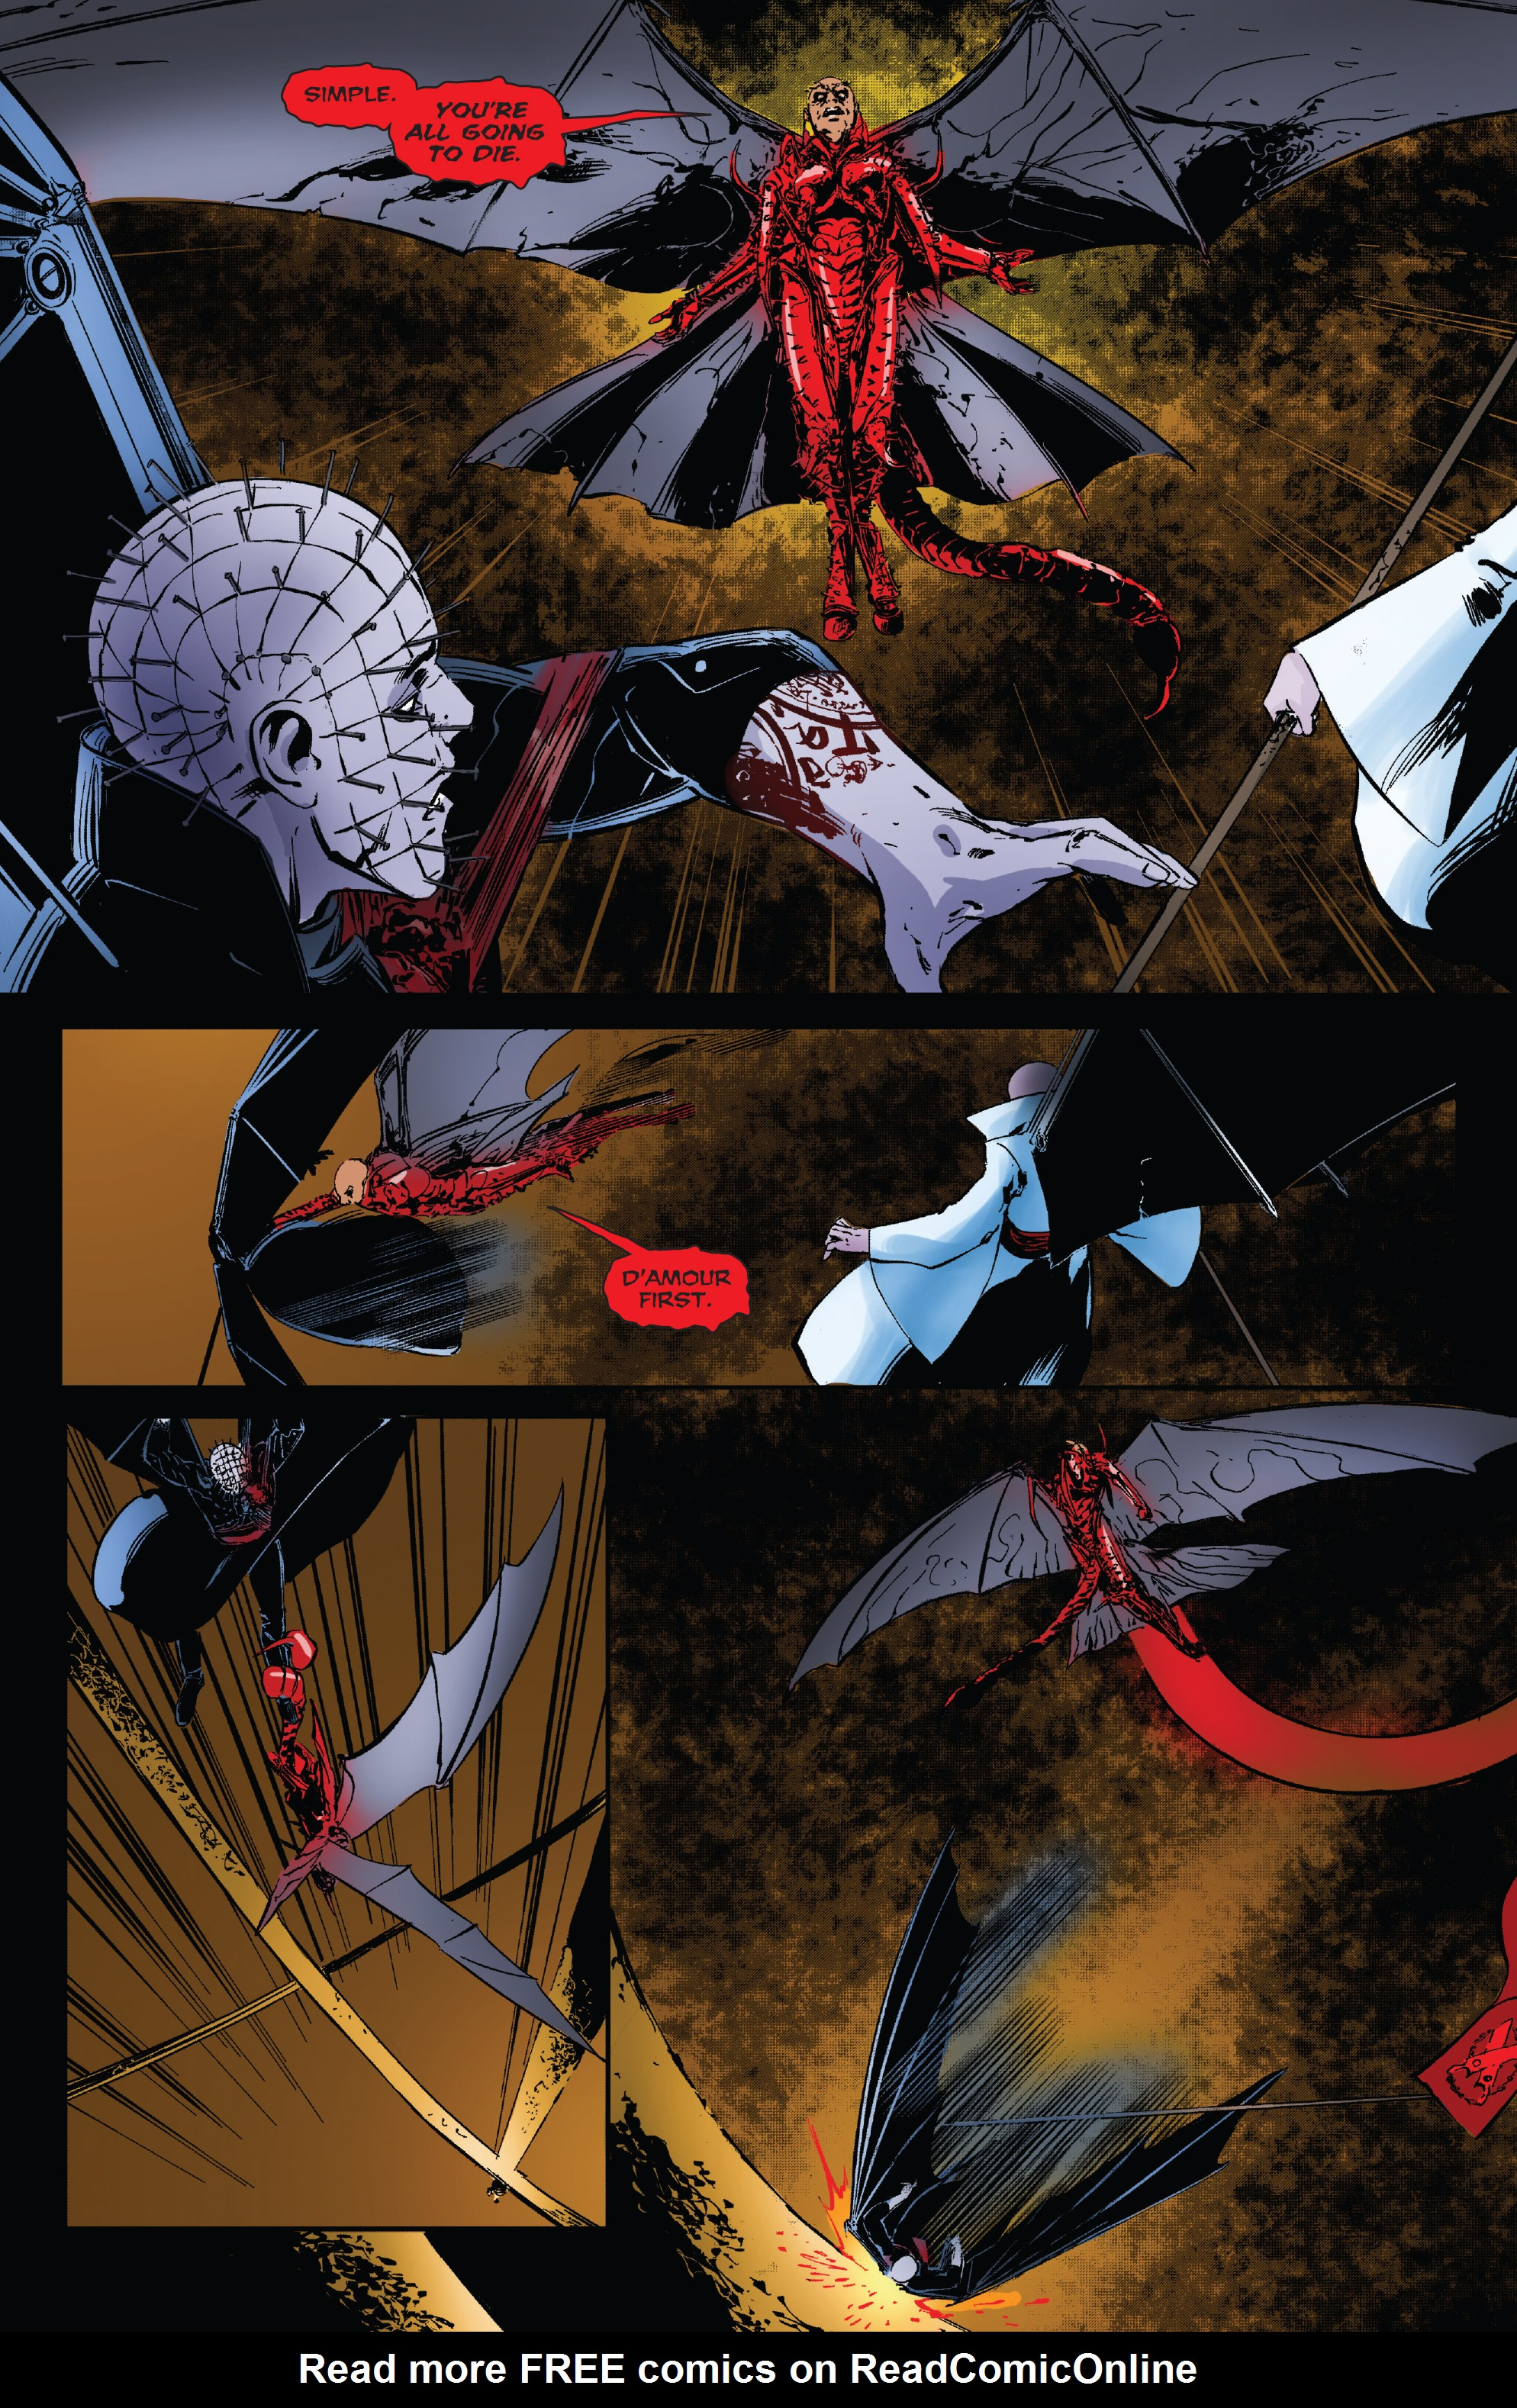 Read online Clive Barker's Hellraiser: The Dark Watch comic -  Issue # TPB 3 - 73